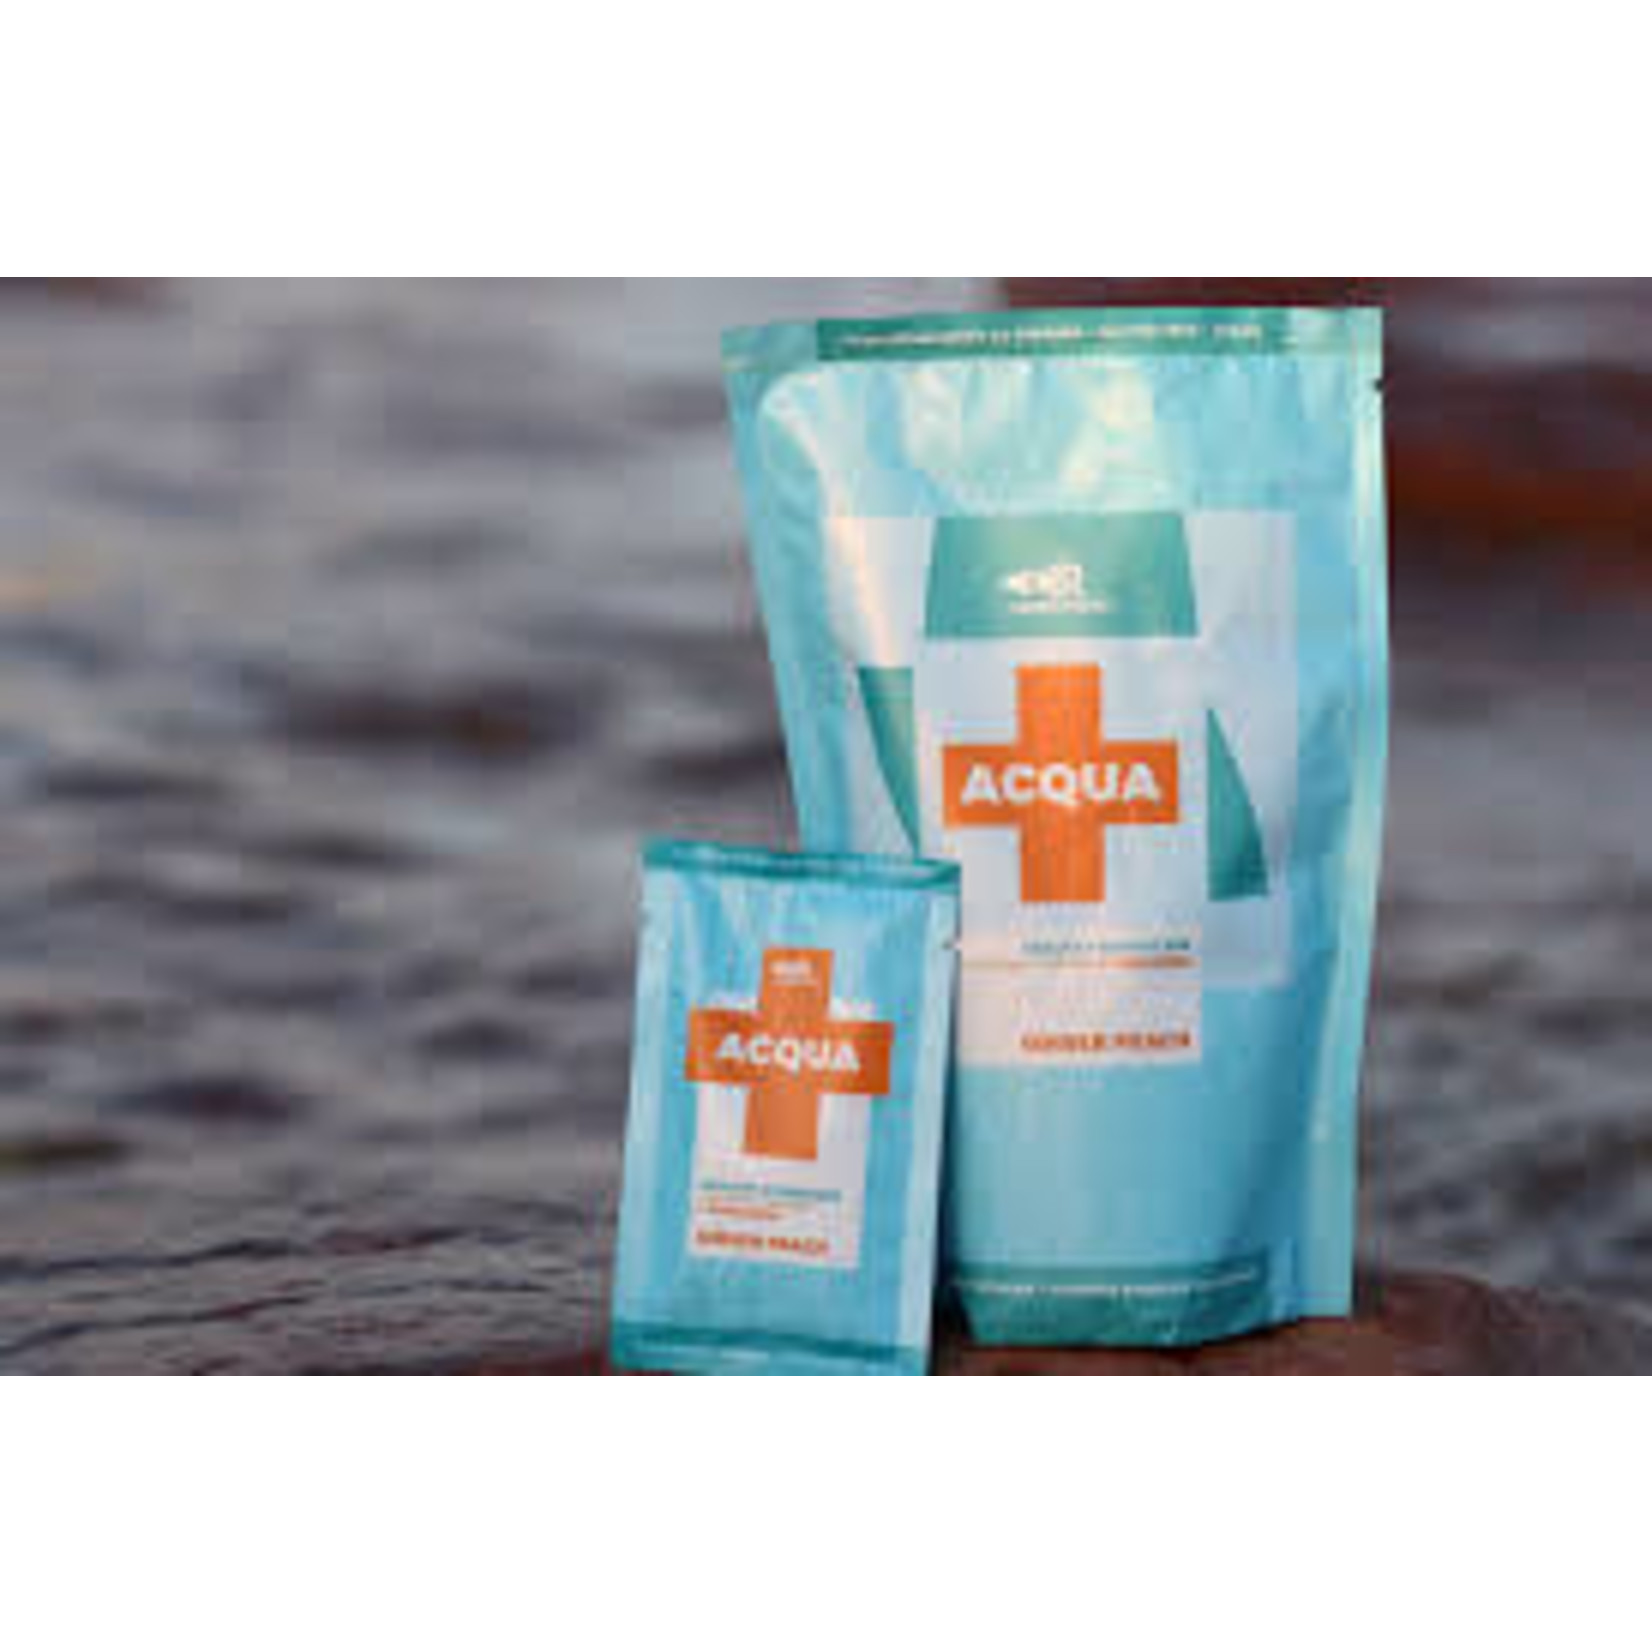 Carborocket CarboRocket ACQUA+  Curcumin (Ginger Peach) 20 Serving Bag